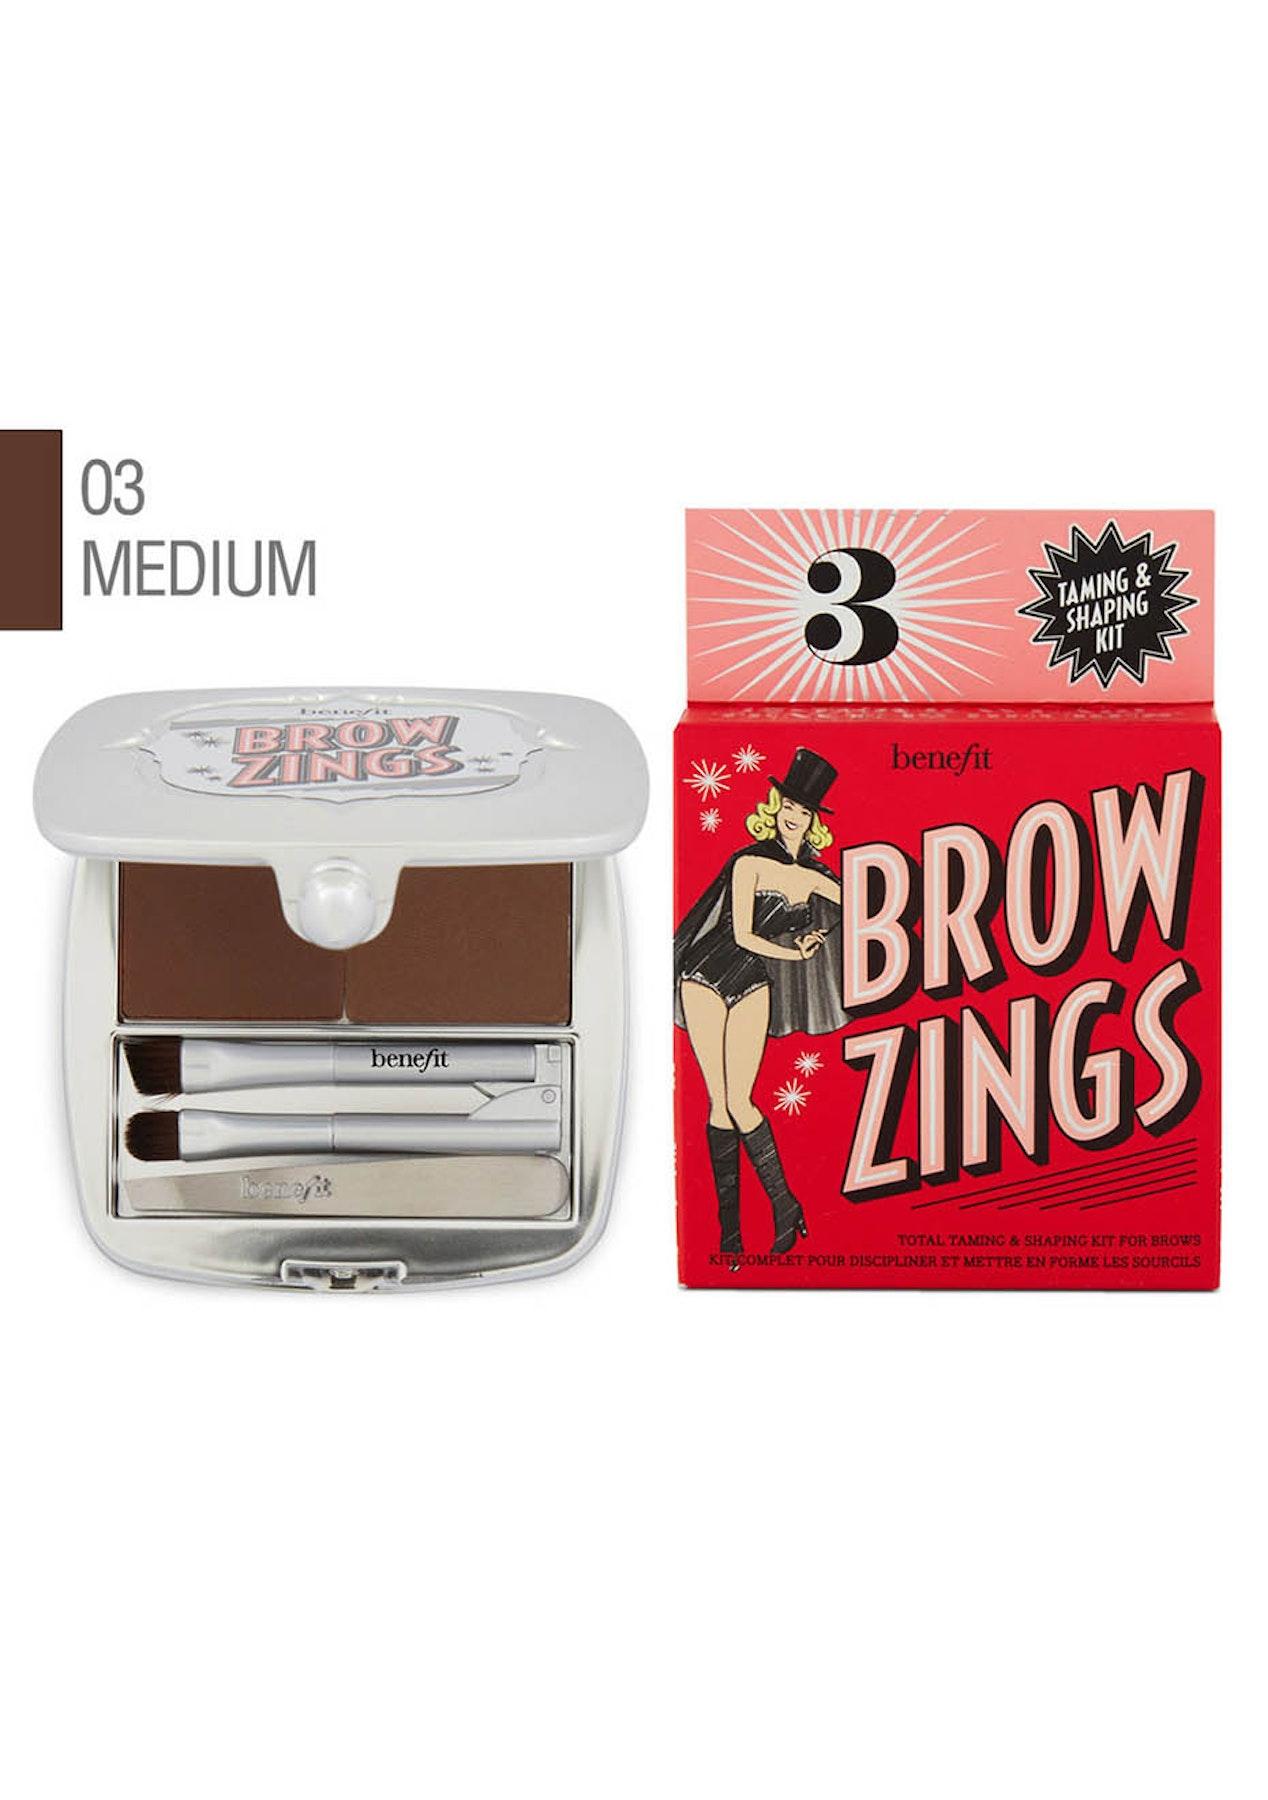 Benefit Brow Zings 03 Medium Eyebrow Shaping Kit Free Shipping